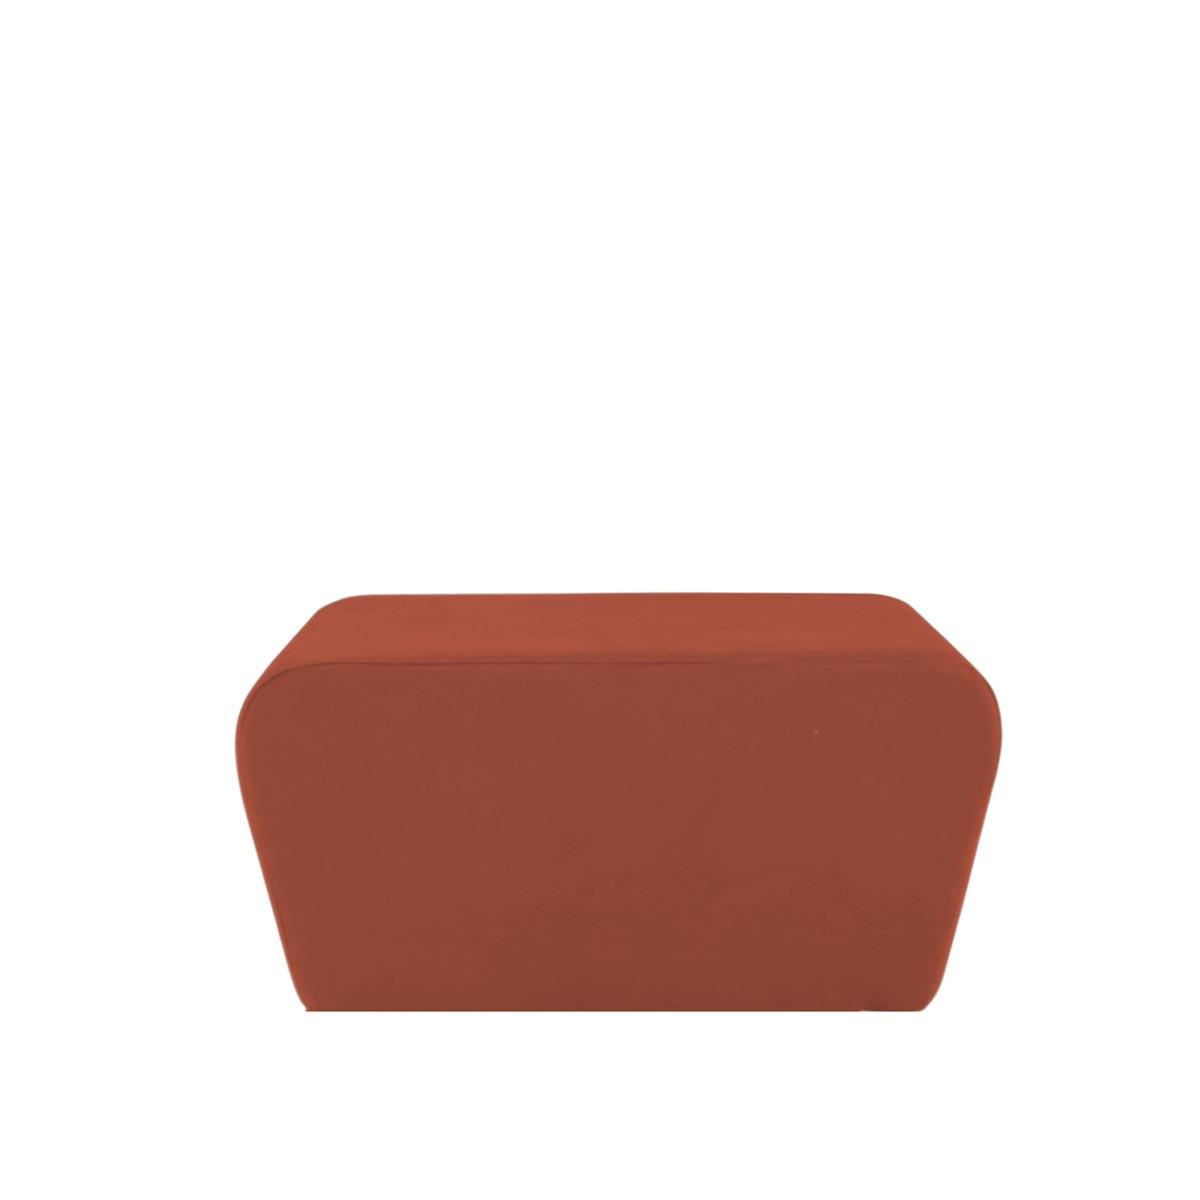 Pufe Muss R02 Tecido Lonita Terracota 03